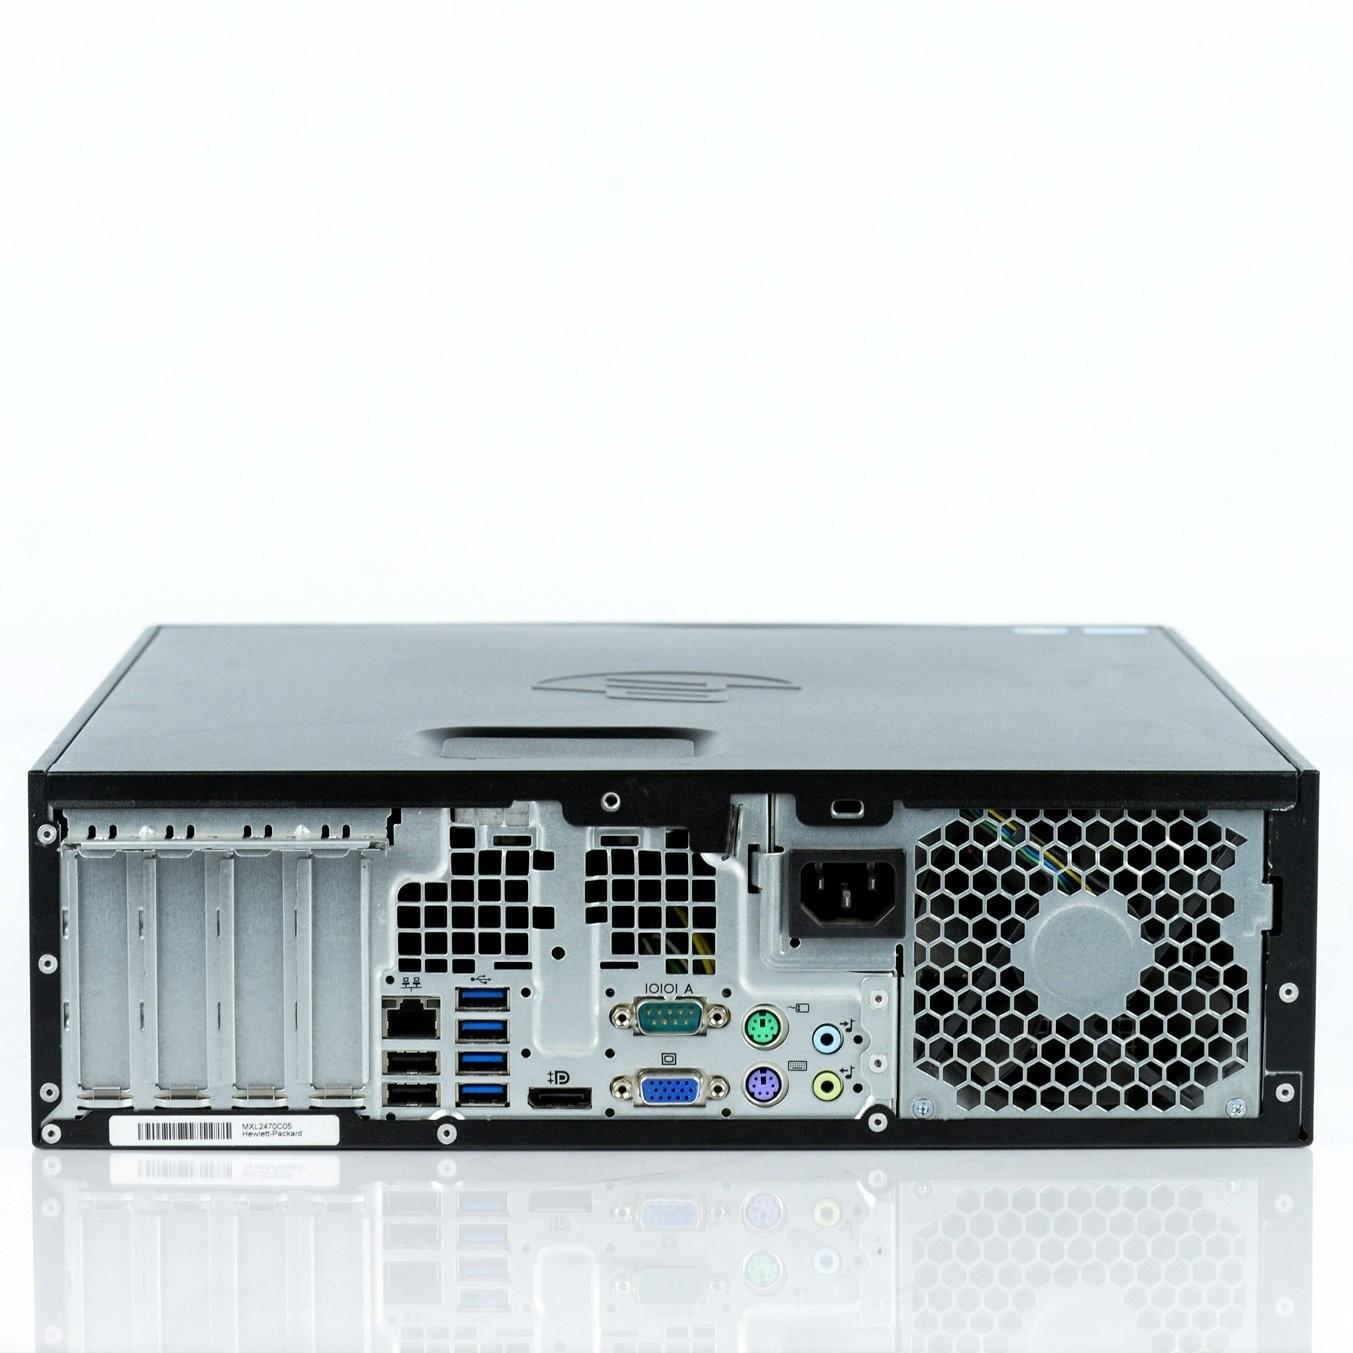 HP Elite 8300 SFF Core i5 3,2 GHz - HDD 500 GB RAM 4 GB